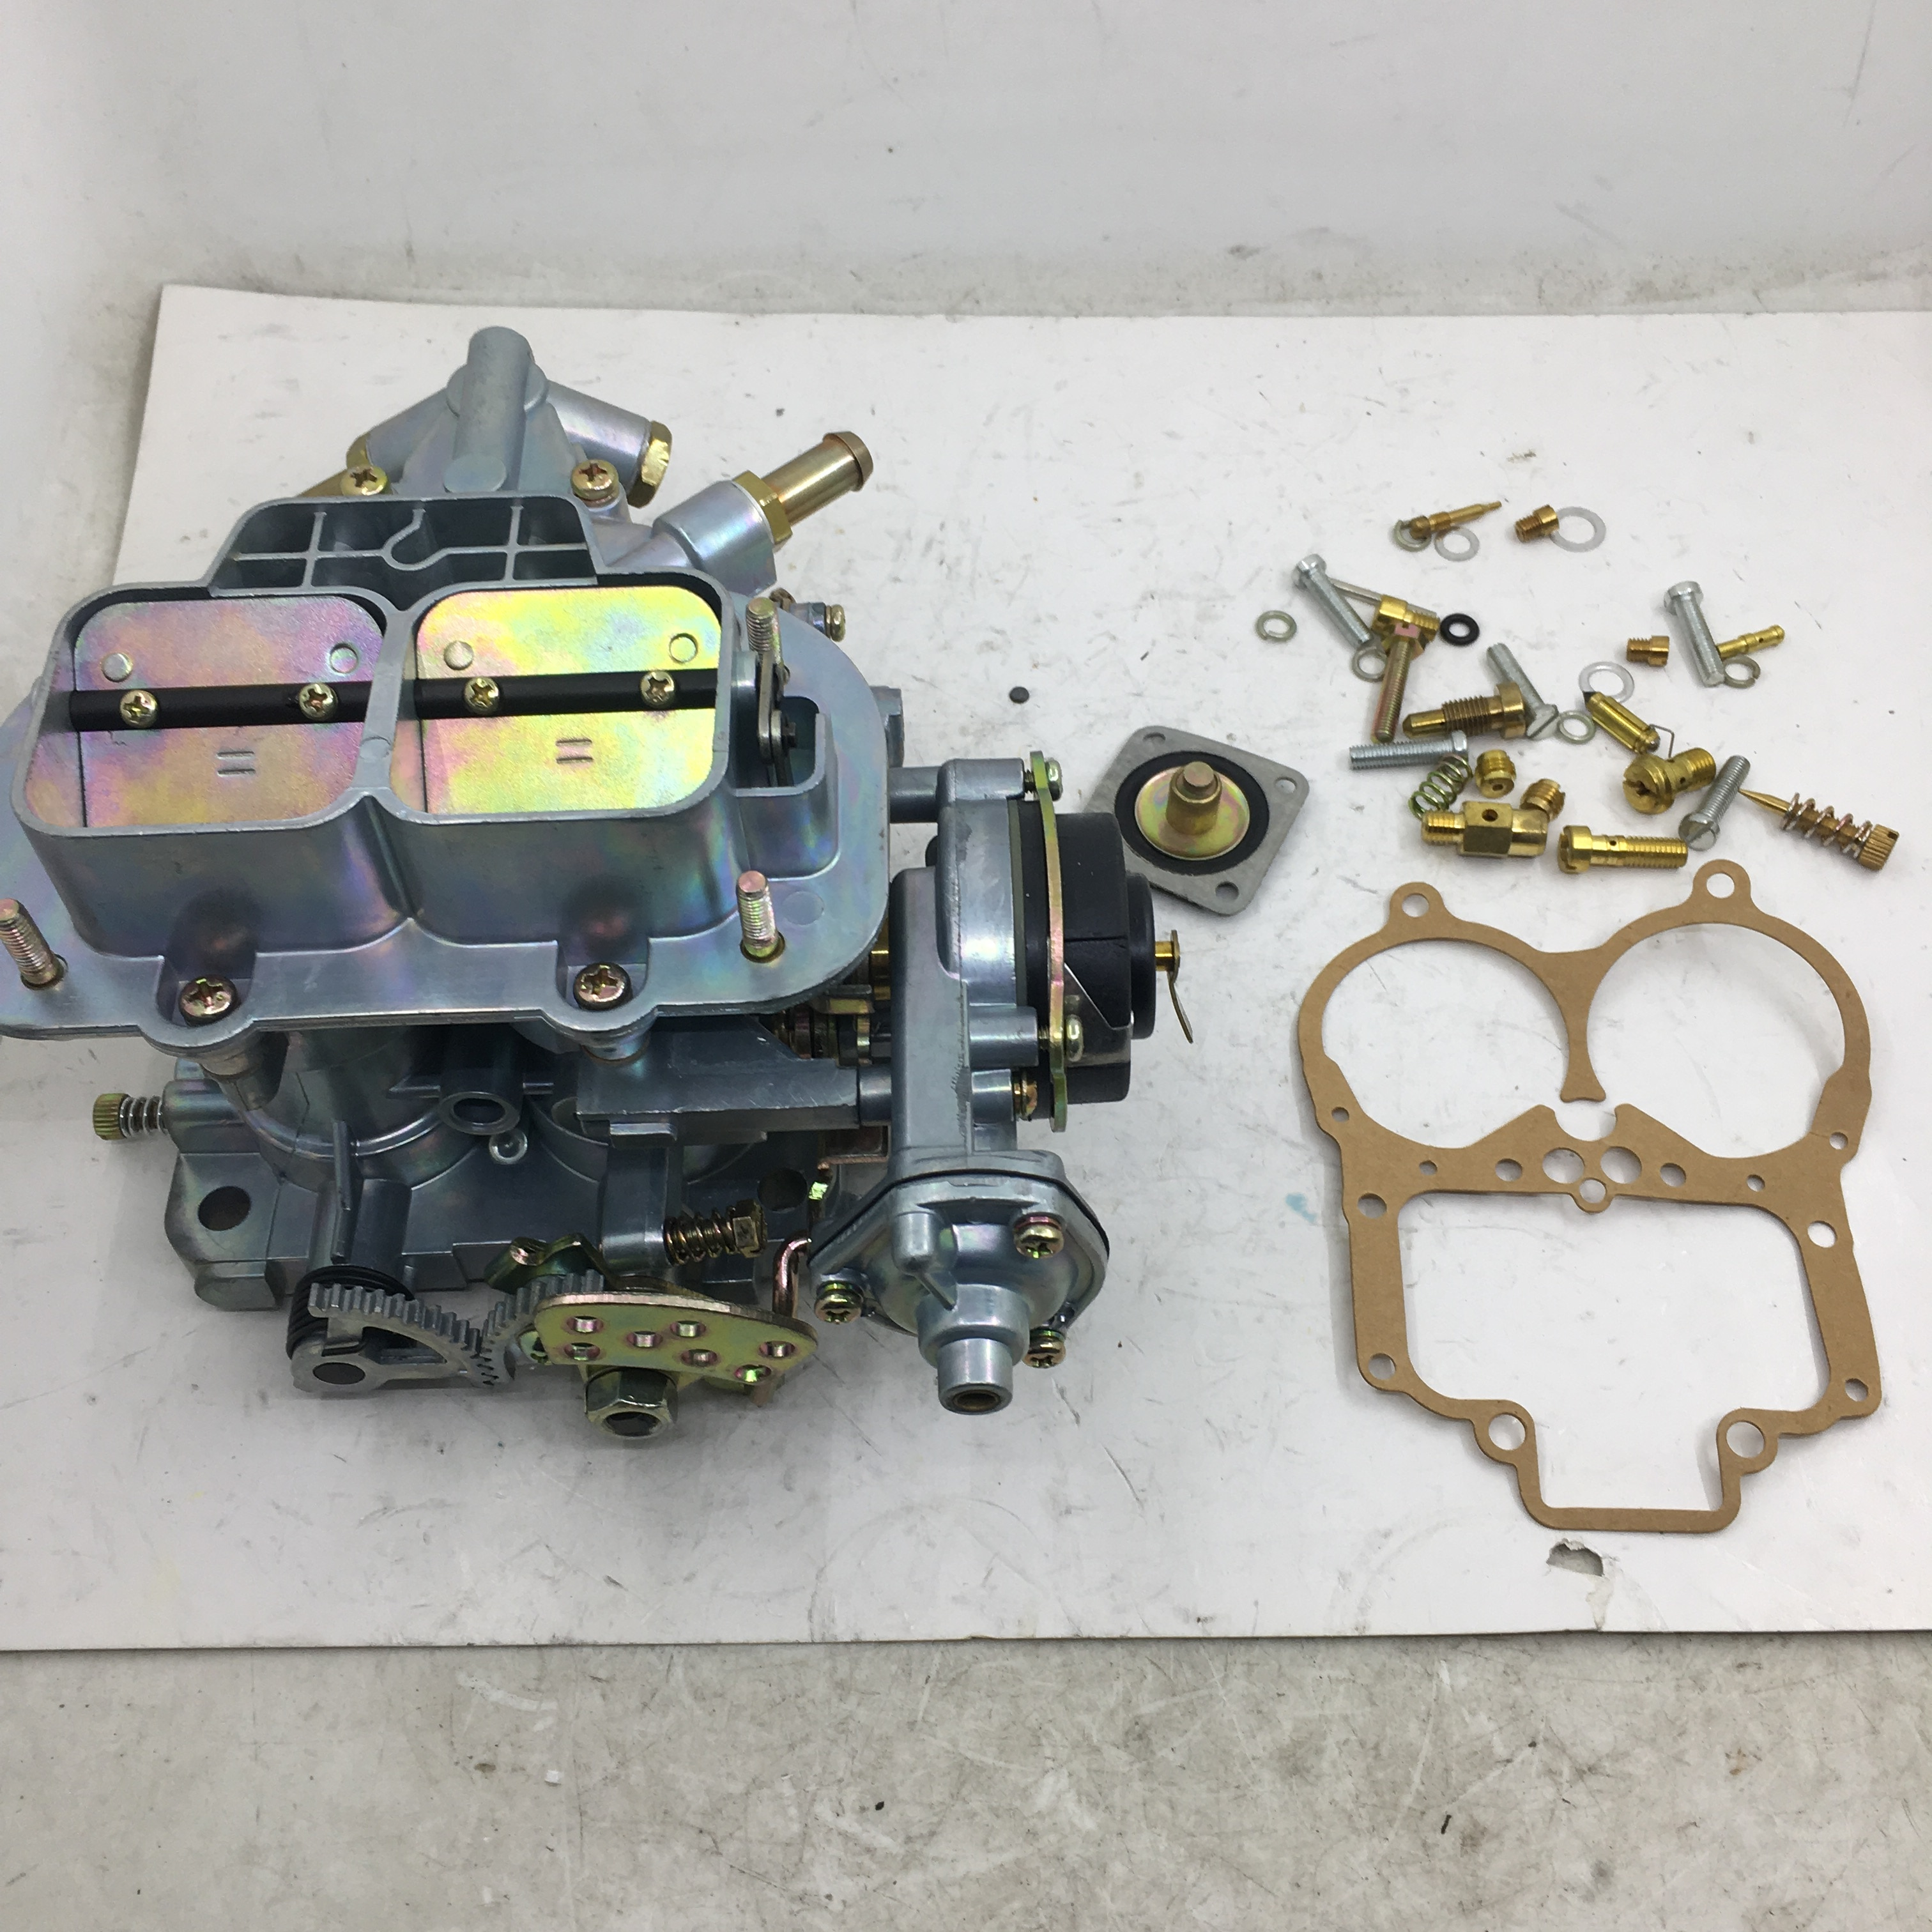 Sherryberg 38x38 weber modelo 38 /38 dges dg fajs carburador tuned kit carb para fiat renault ford vw bmw 390 cfm bmw daewoo dodge